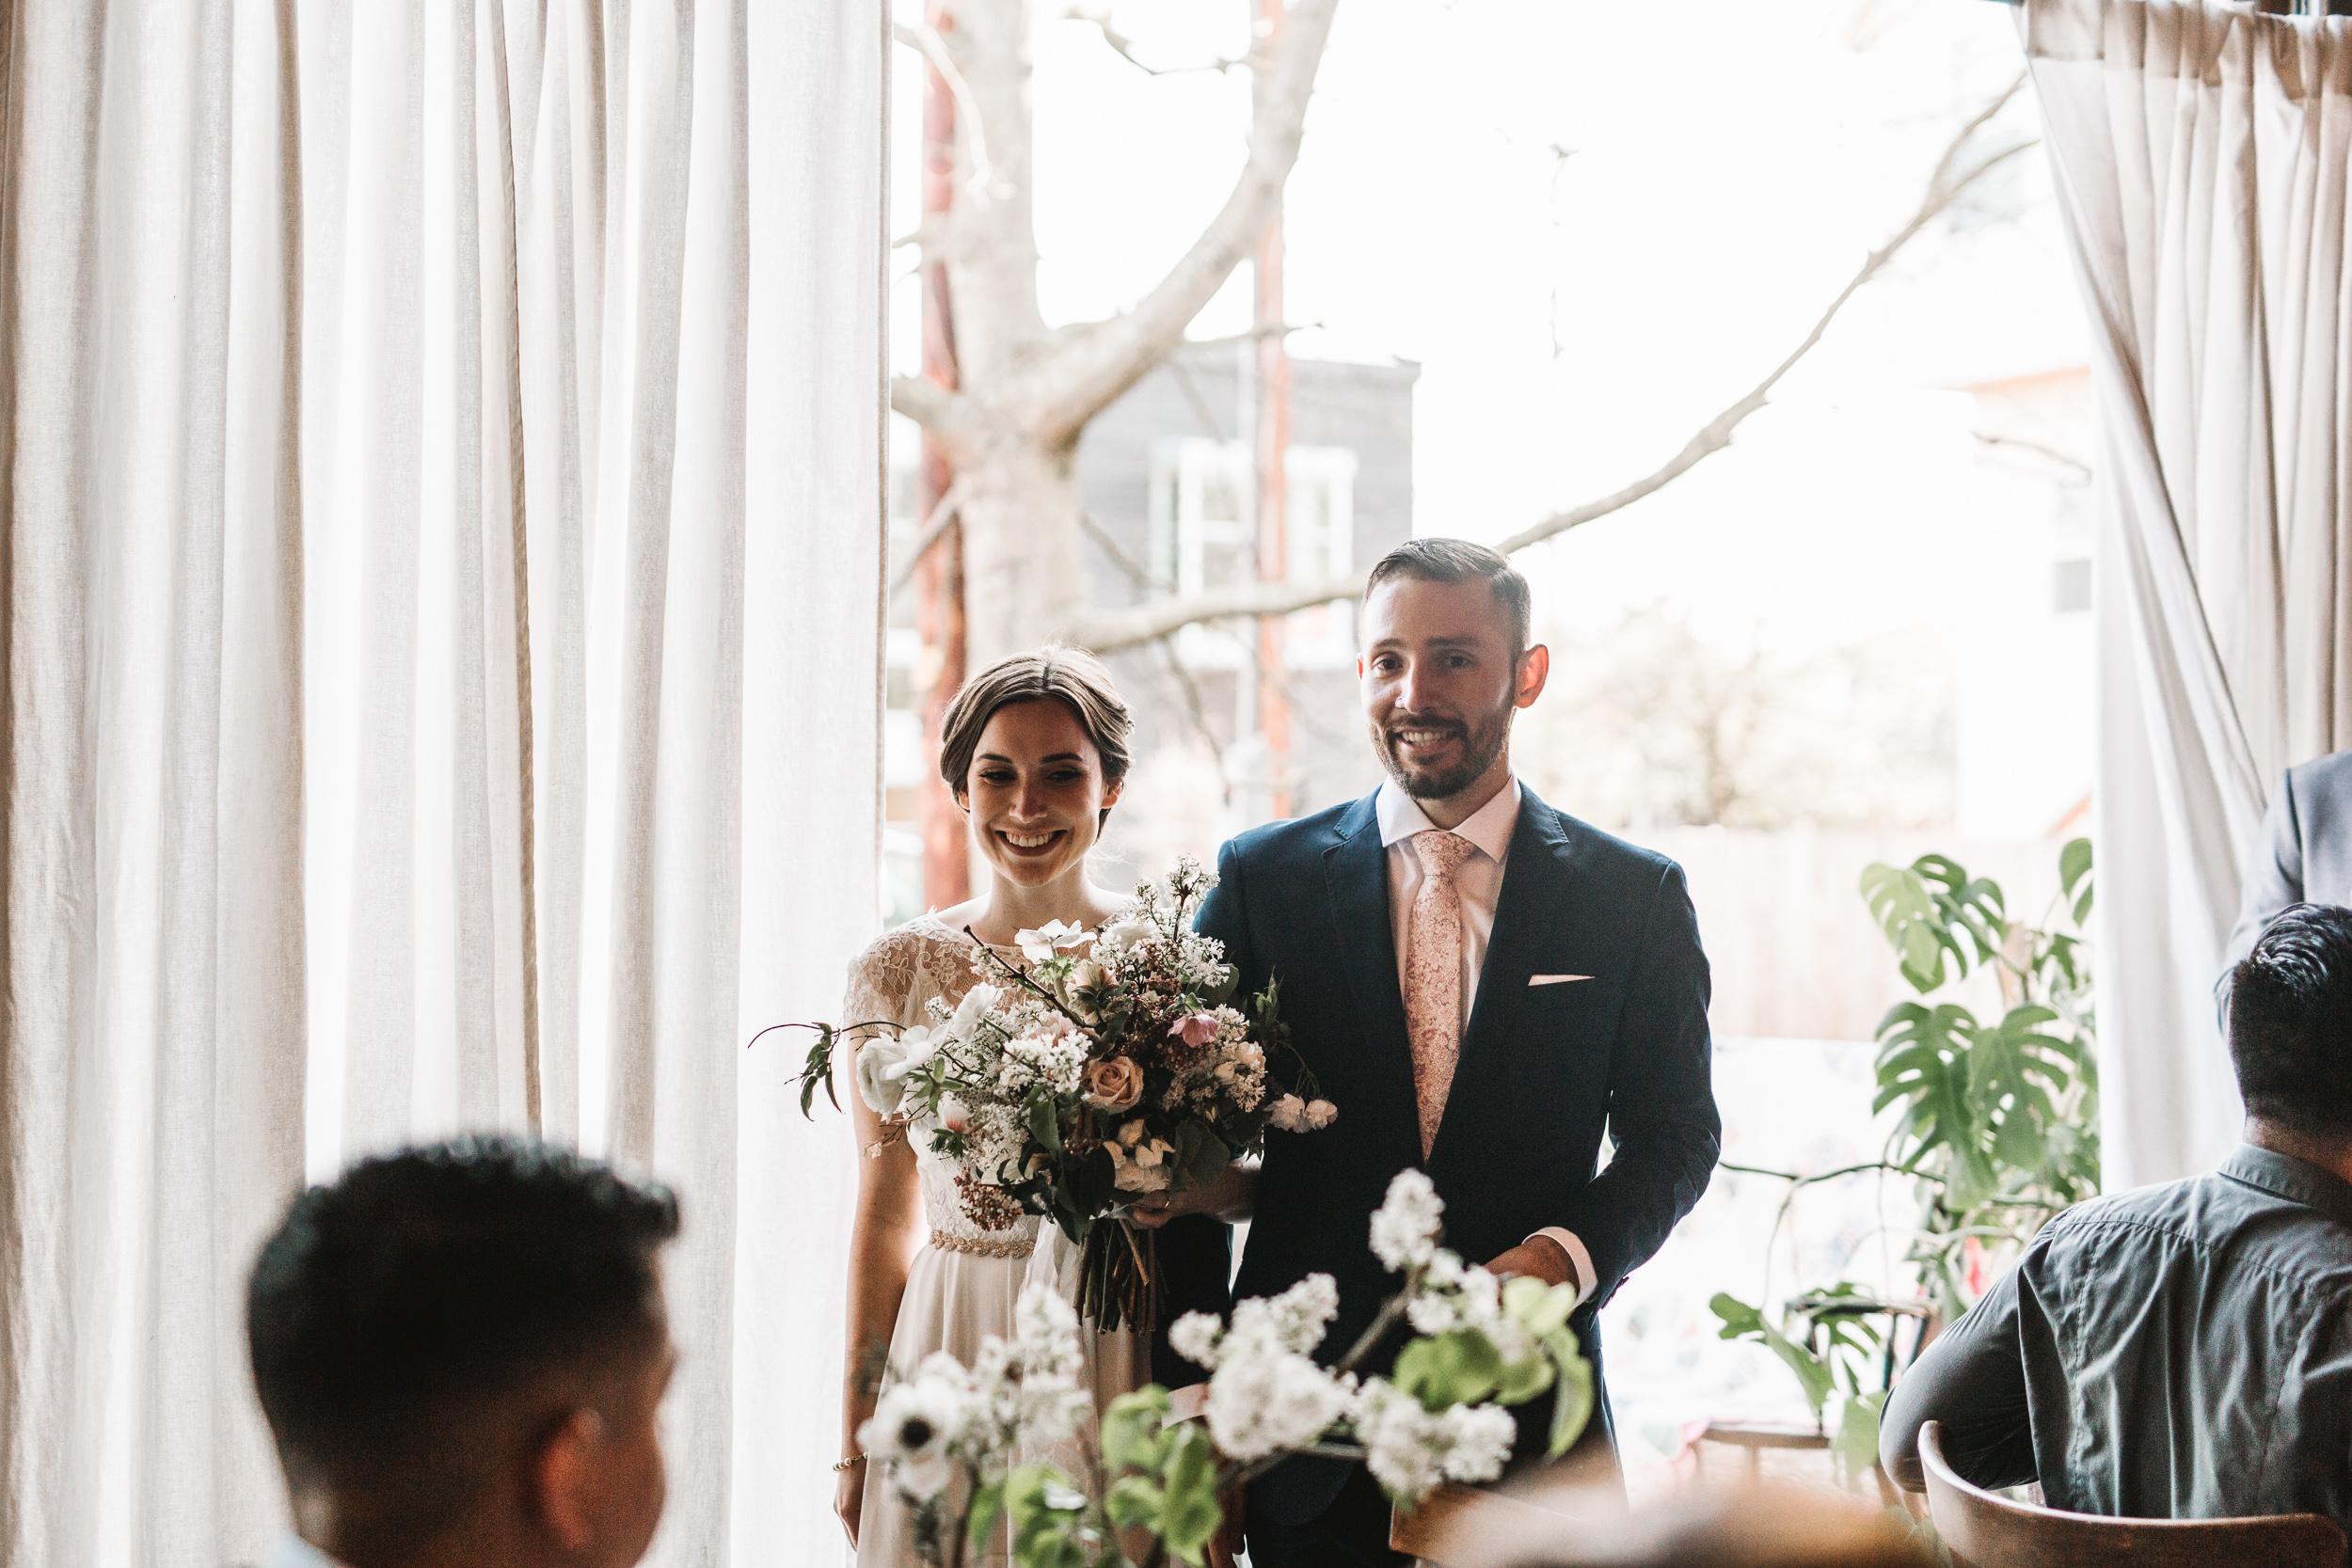 door-of-hope-wedding-portland-artistic-wedding-photography-2254.jpg